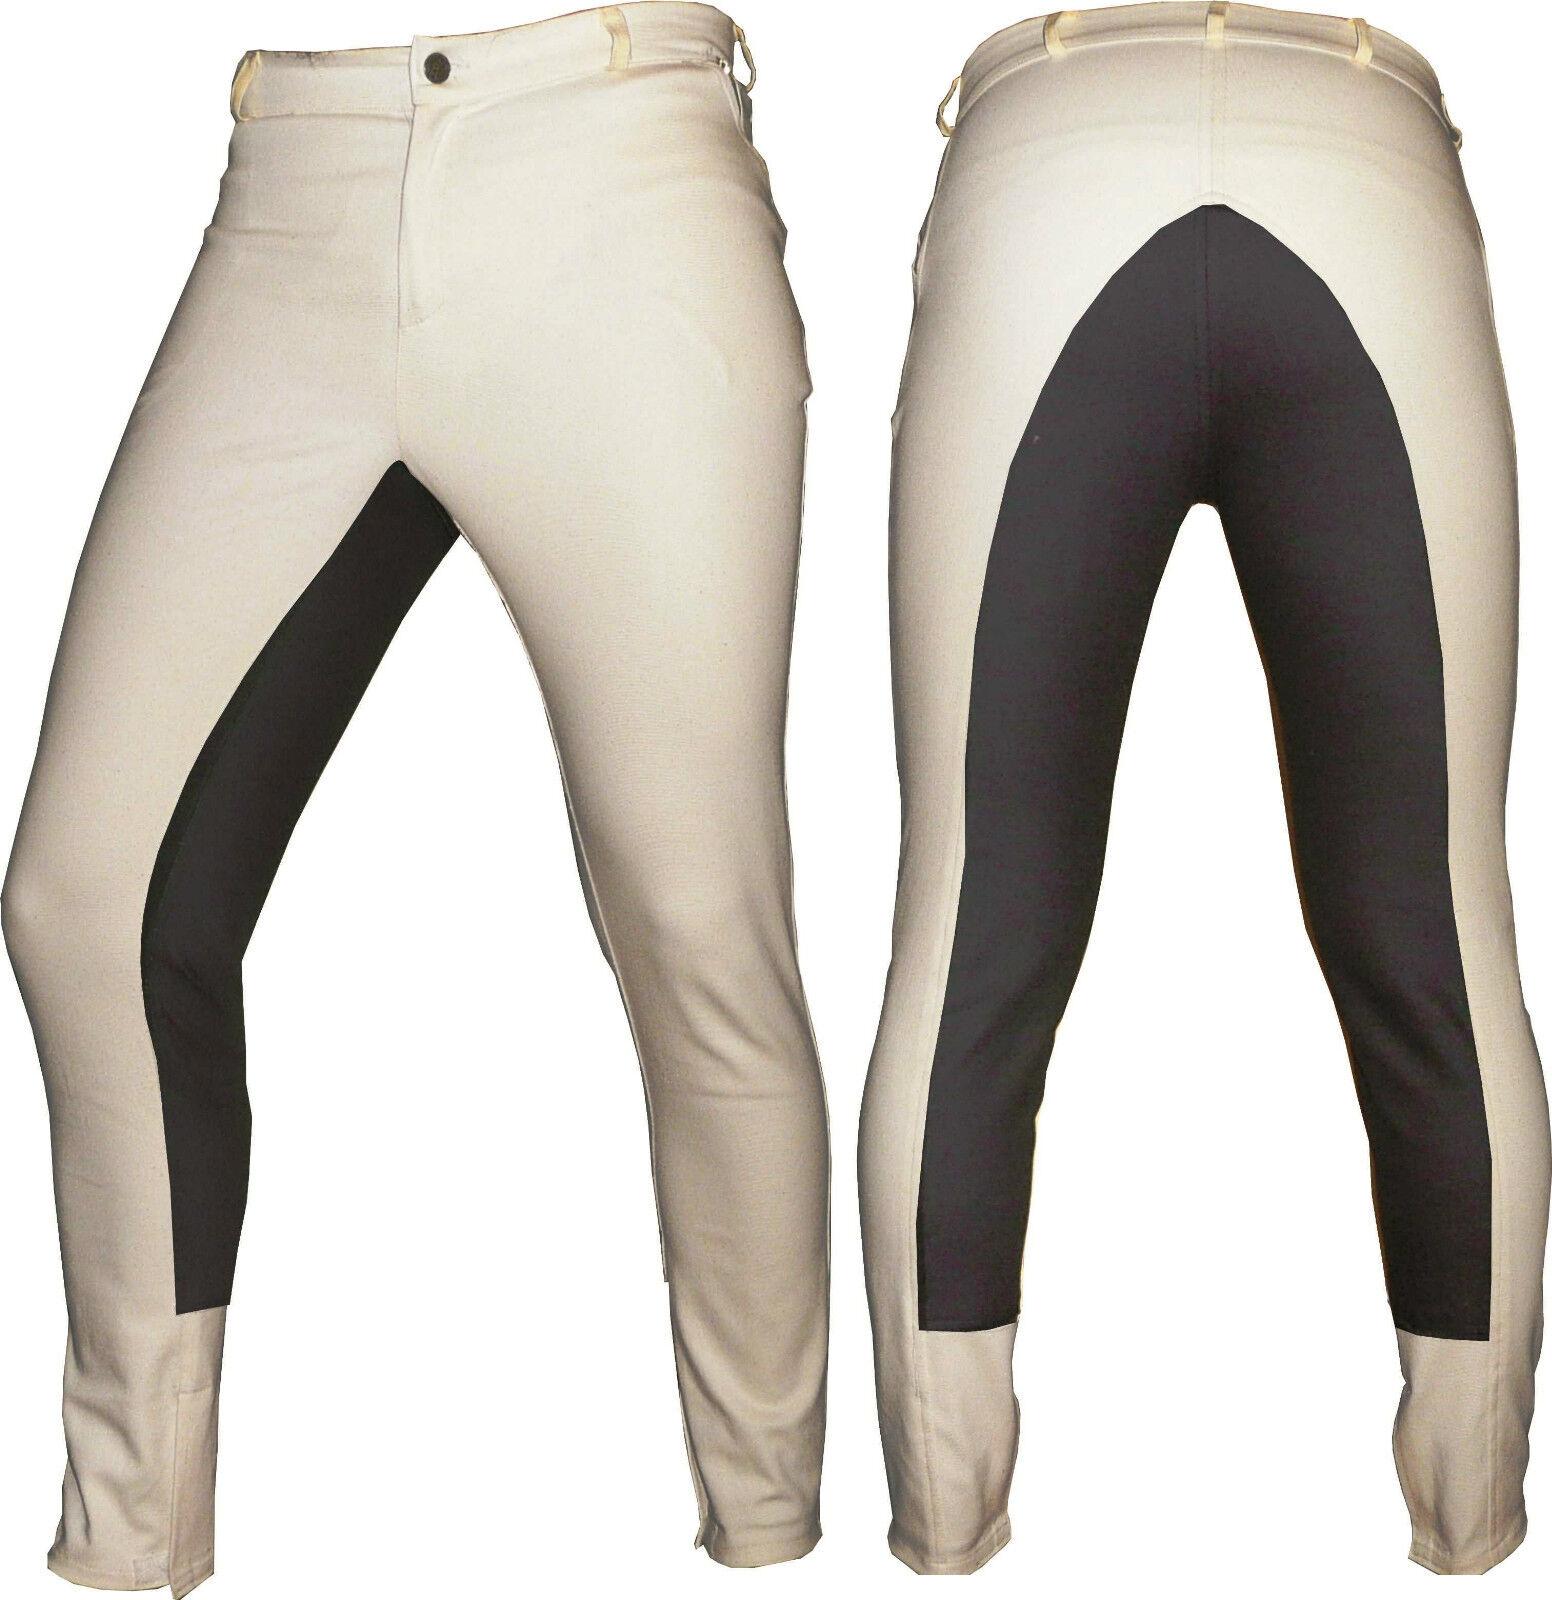 Beige / Braun Dressage Horse Riding Pants Seat Full Seat Pants Breeches breech & dressage 114976